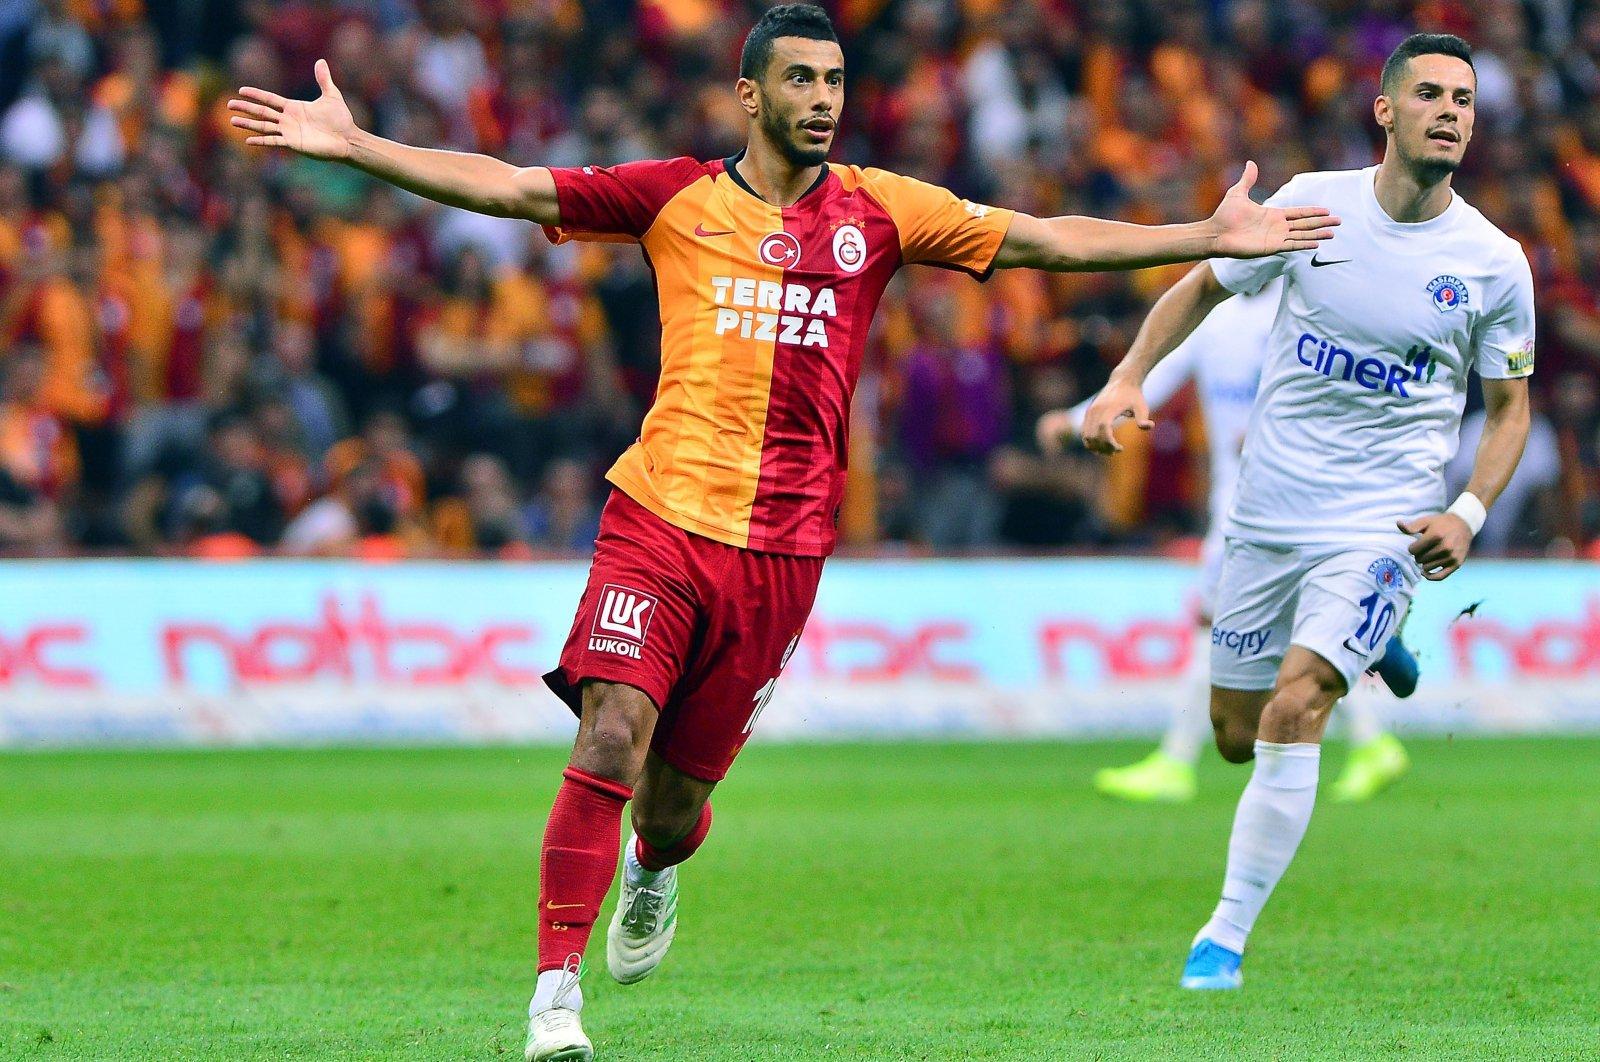 Galatasaray's Moroccan midfielder celebrates a goal against Kasımpaşa at theRecep Tayyip Erdoğan Stadium, Istanbul, Turkey, Feb. 17, 2019.